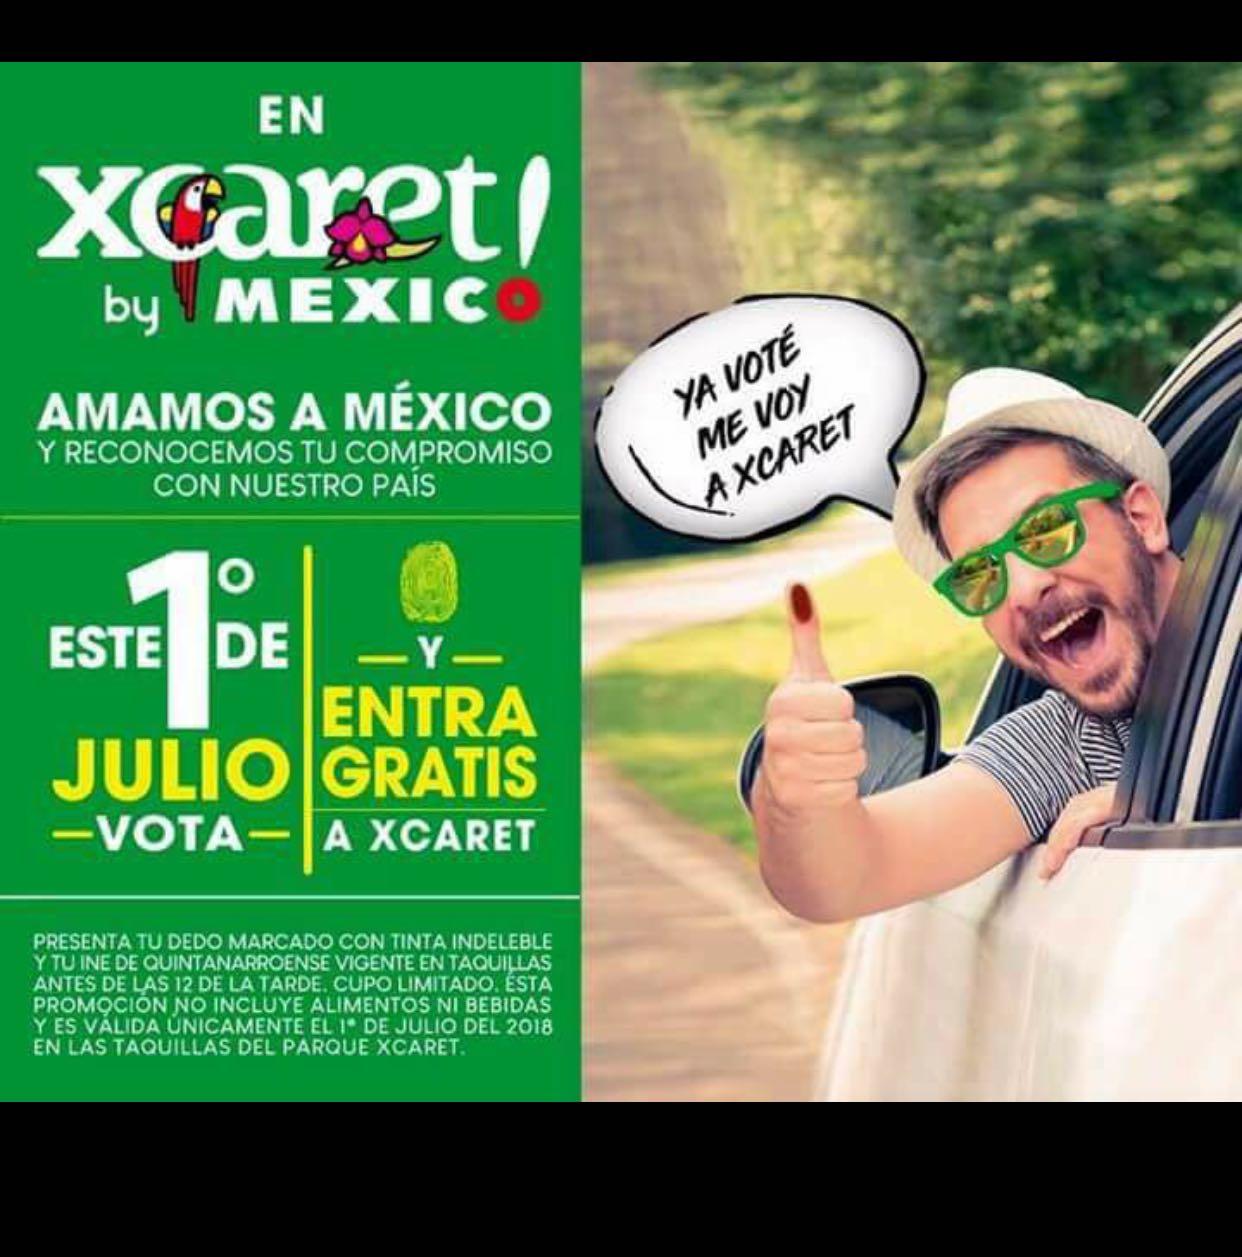 Xcaret Park: Vota este 1 de julio y Entra Gratis